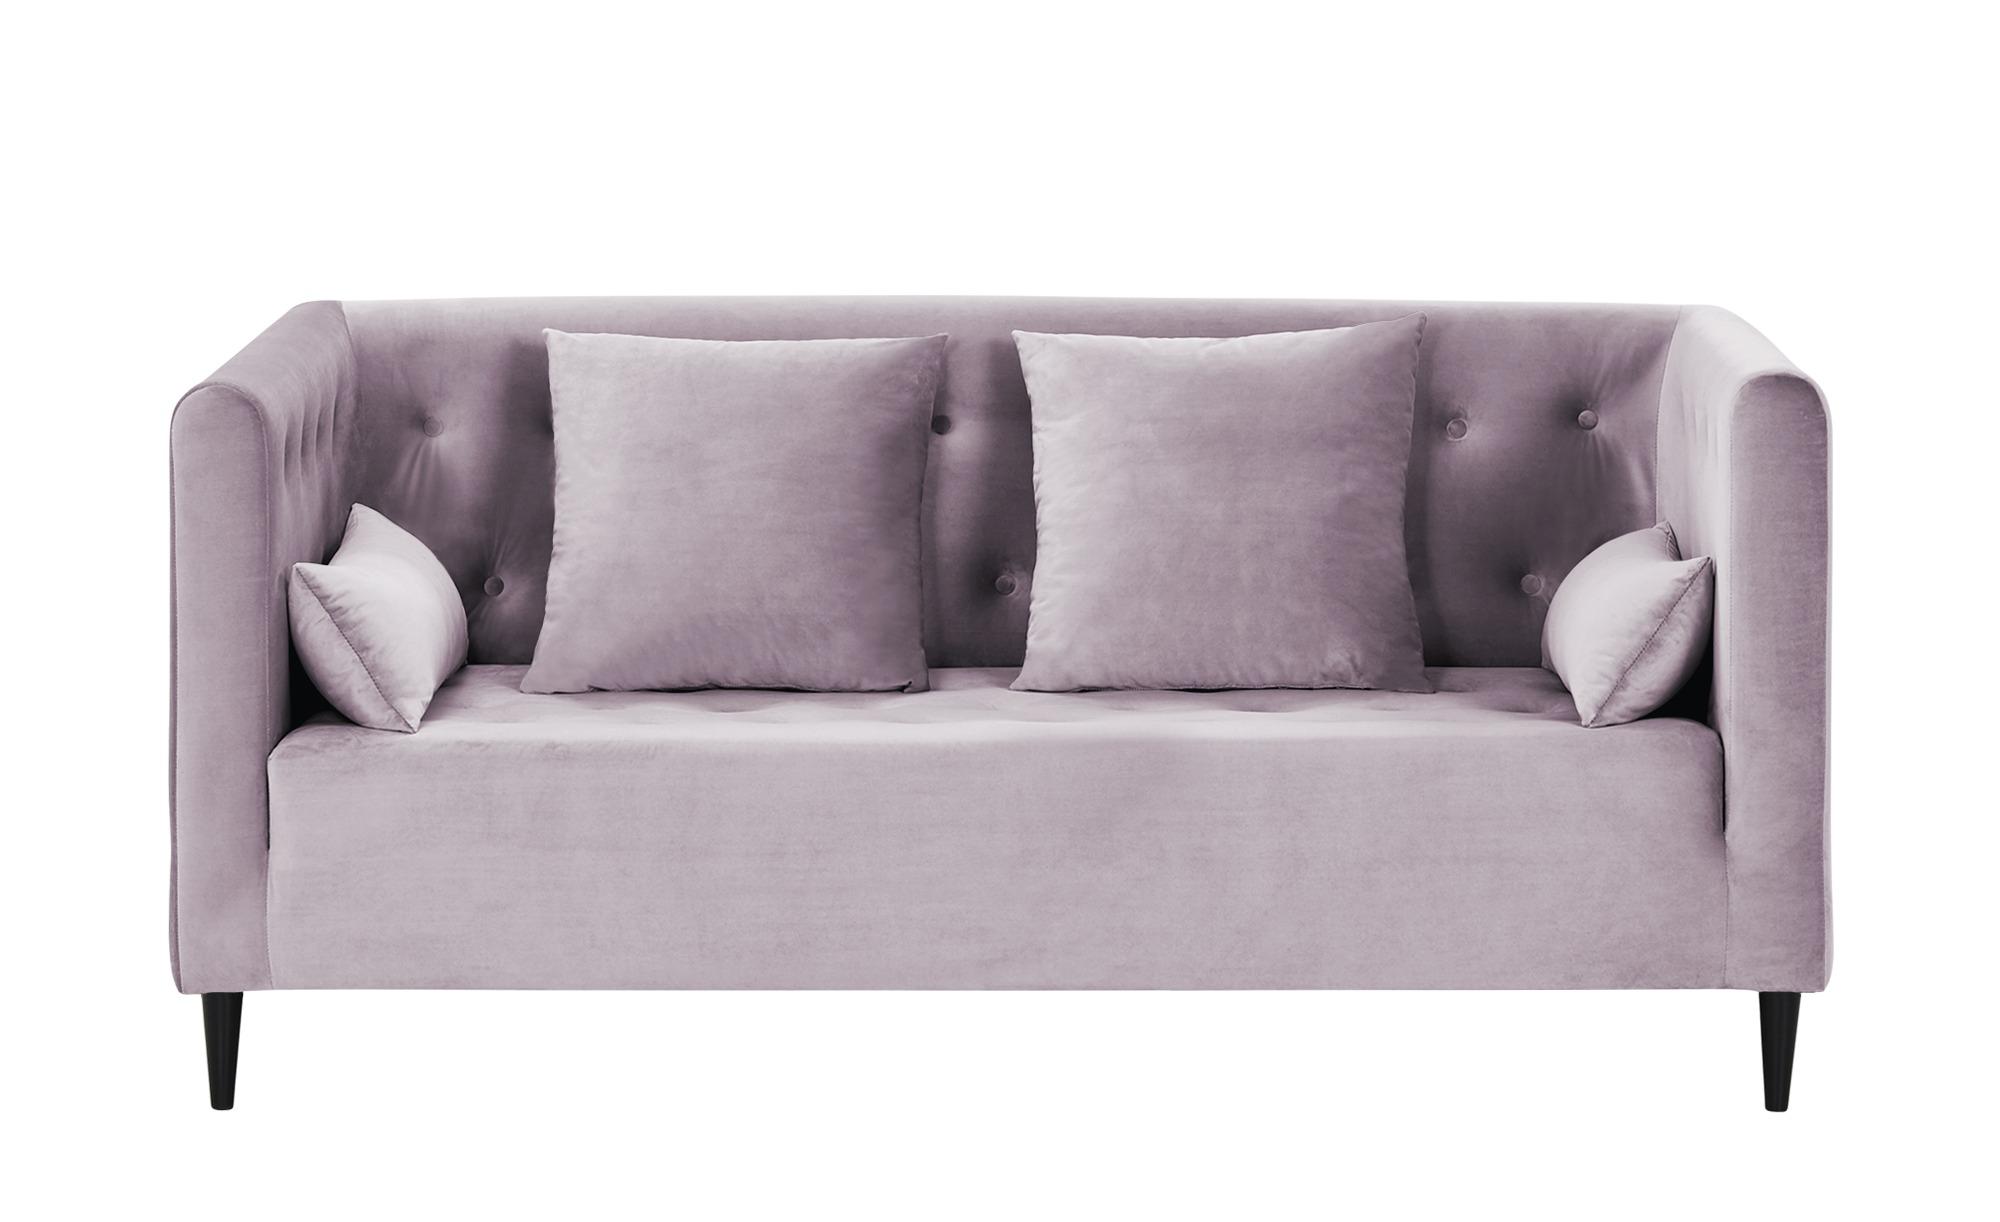 smart Sofa  Neea ¦ rosa/pink ¦ Maße (cm): B: 181 H: 82 T: 88 Polstermöbel > Sofas > 2-Sitzer - Höffner